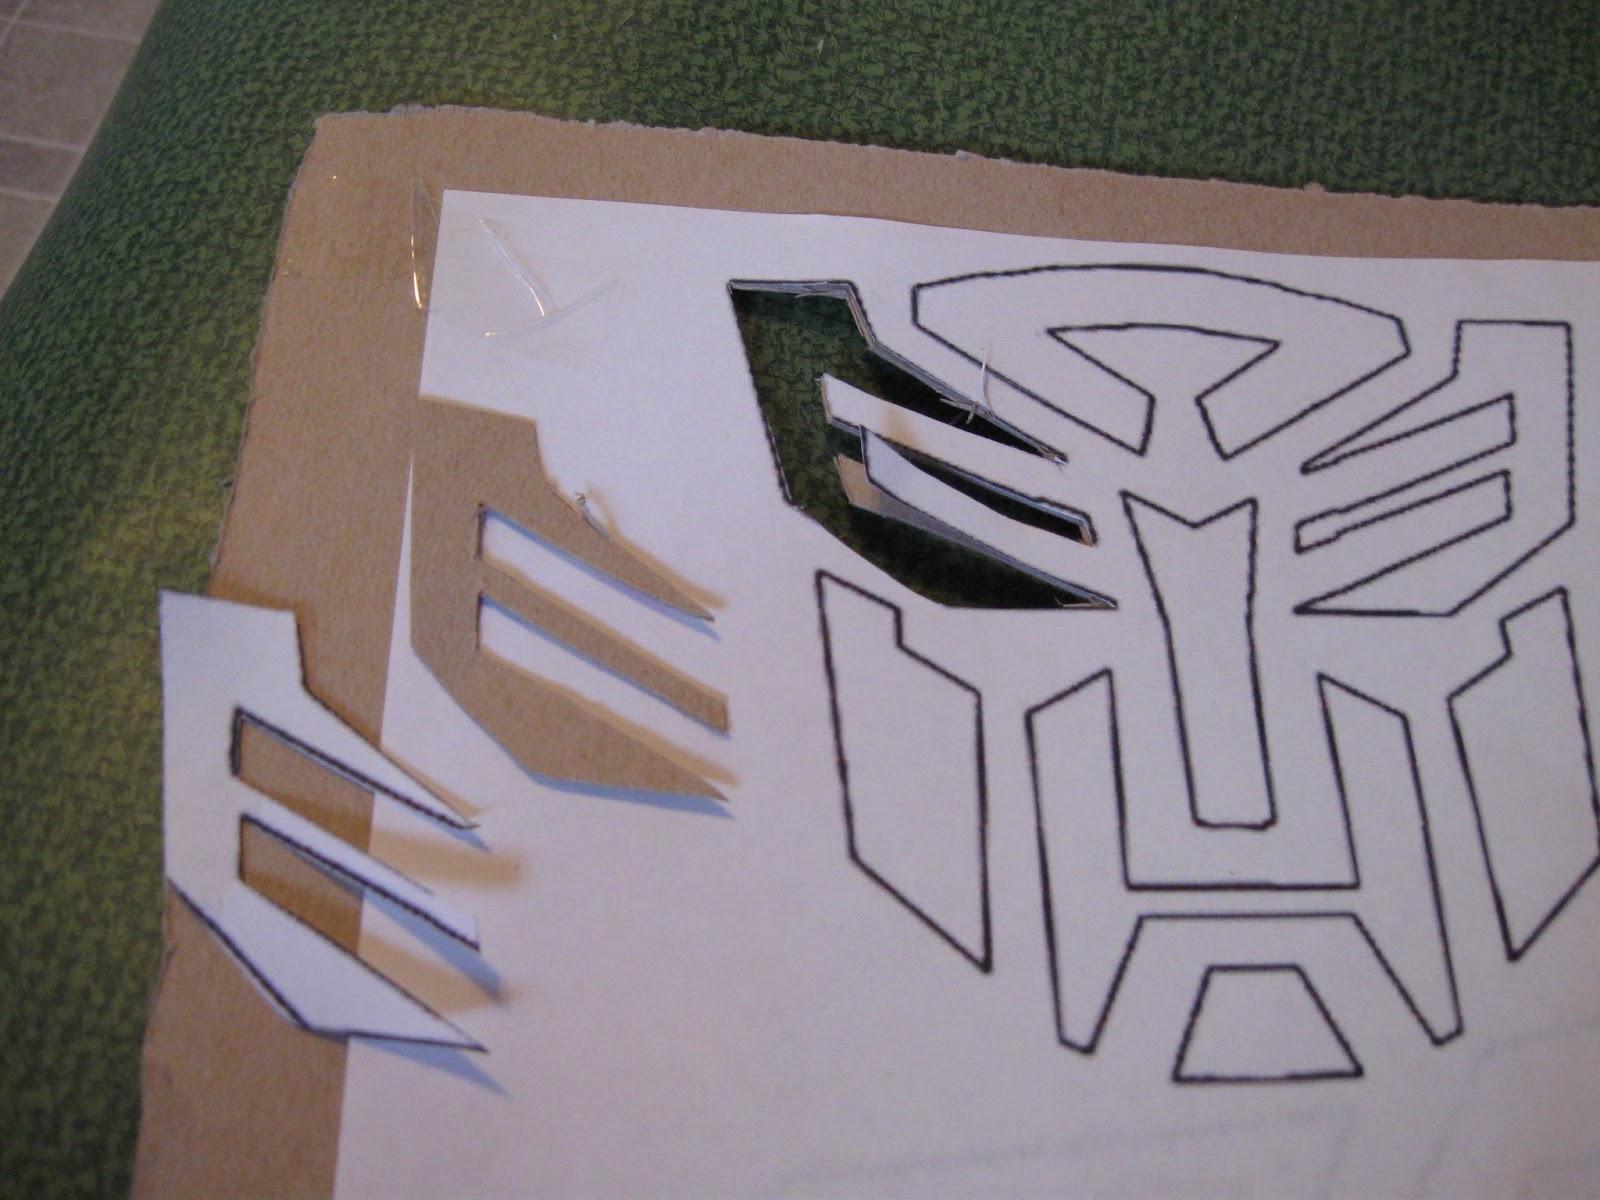 How to make a stencil